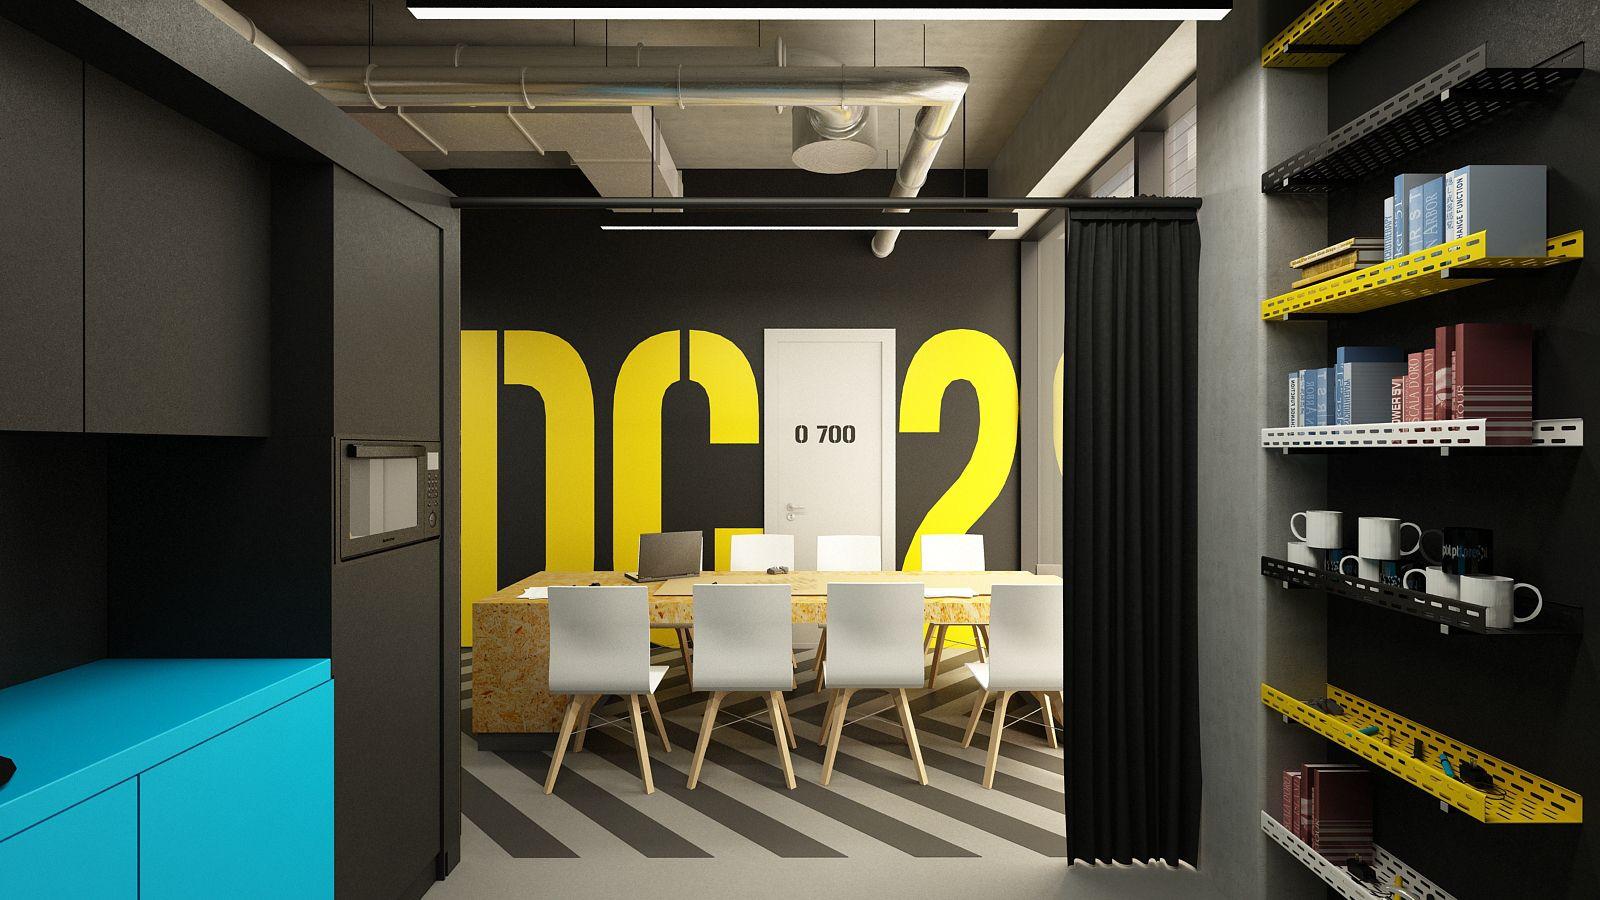 office kitchenette design. Office Kitchenette Designeld Poland Eld Create Pinterest Inspiration Kitchen Design Ideas Decorating G